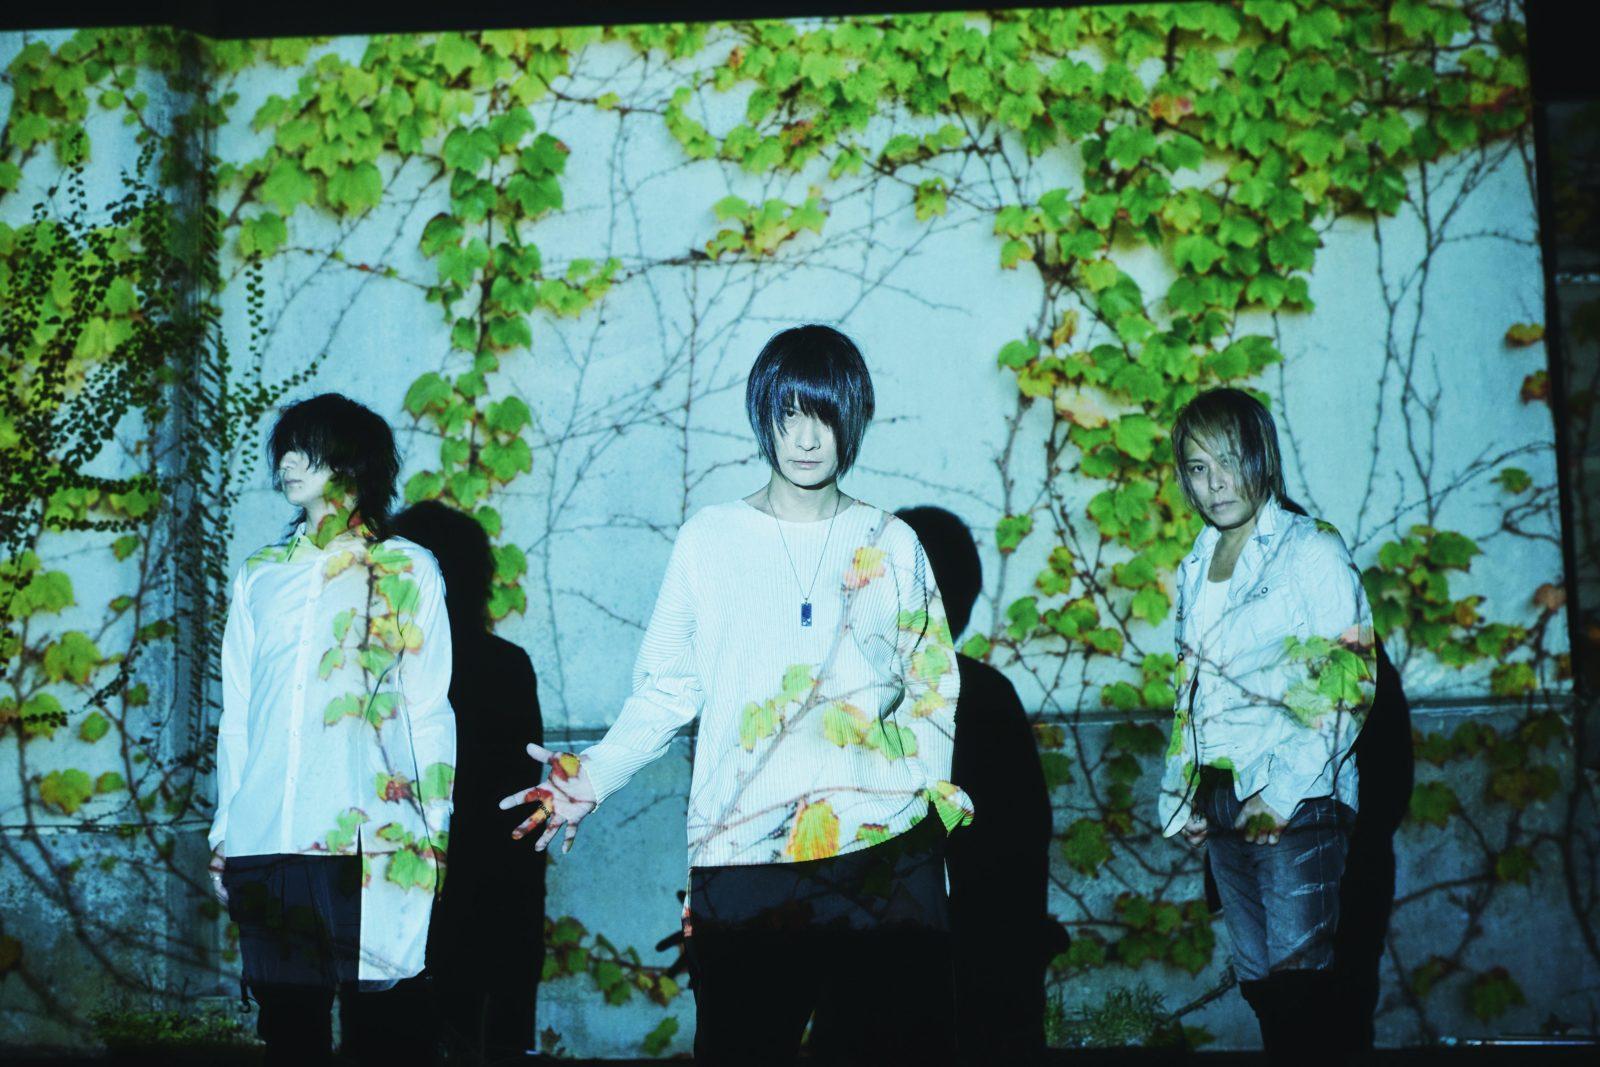 BLUEVINE、3月18日発売の1st mini Album「RAINDROP」トレーラー解禁サムネイル画像